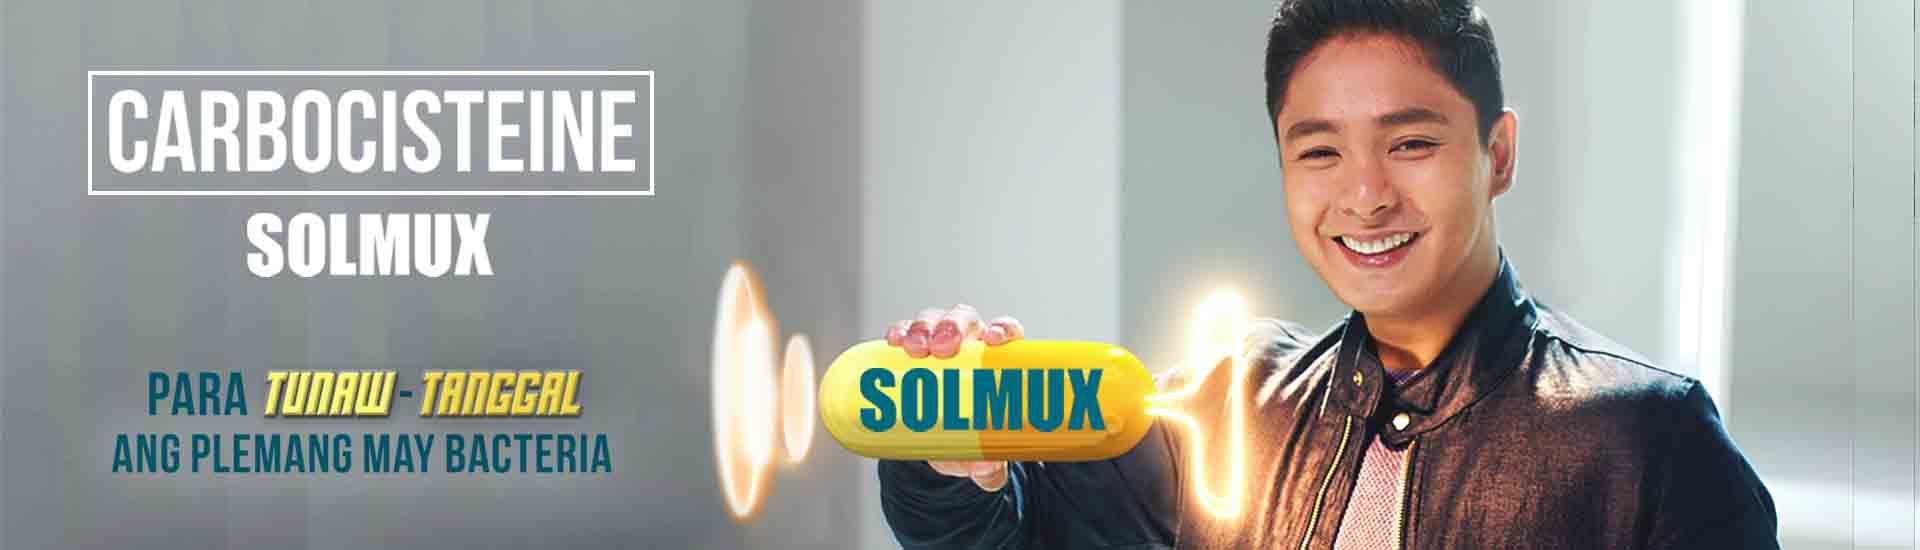 Solmux Capsule Banner